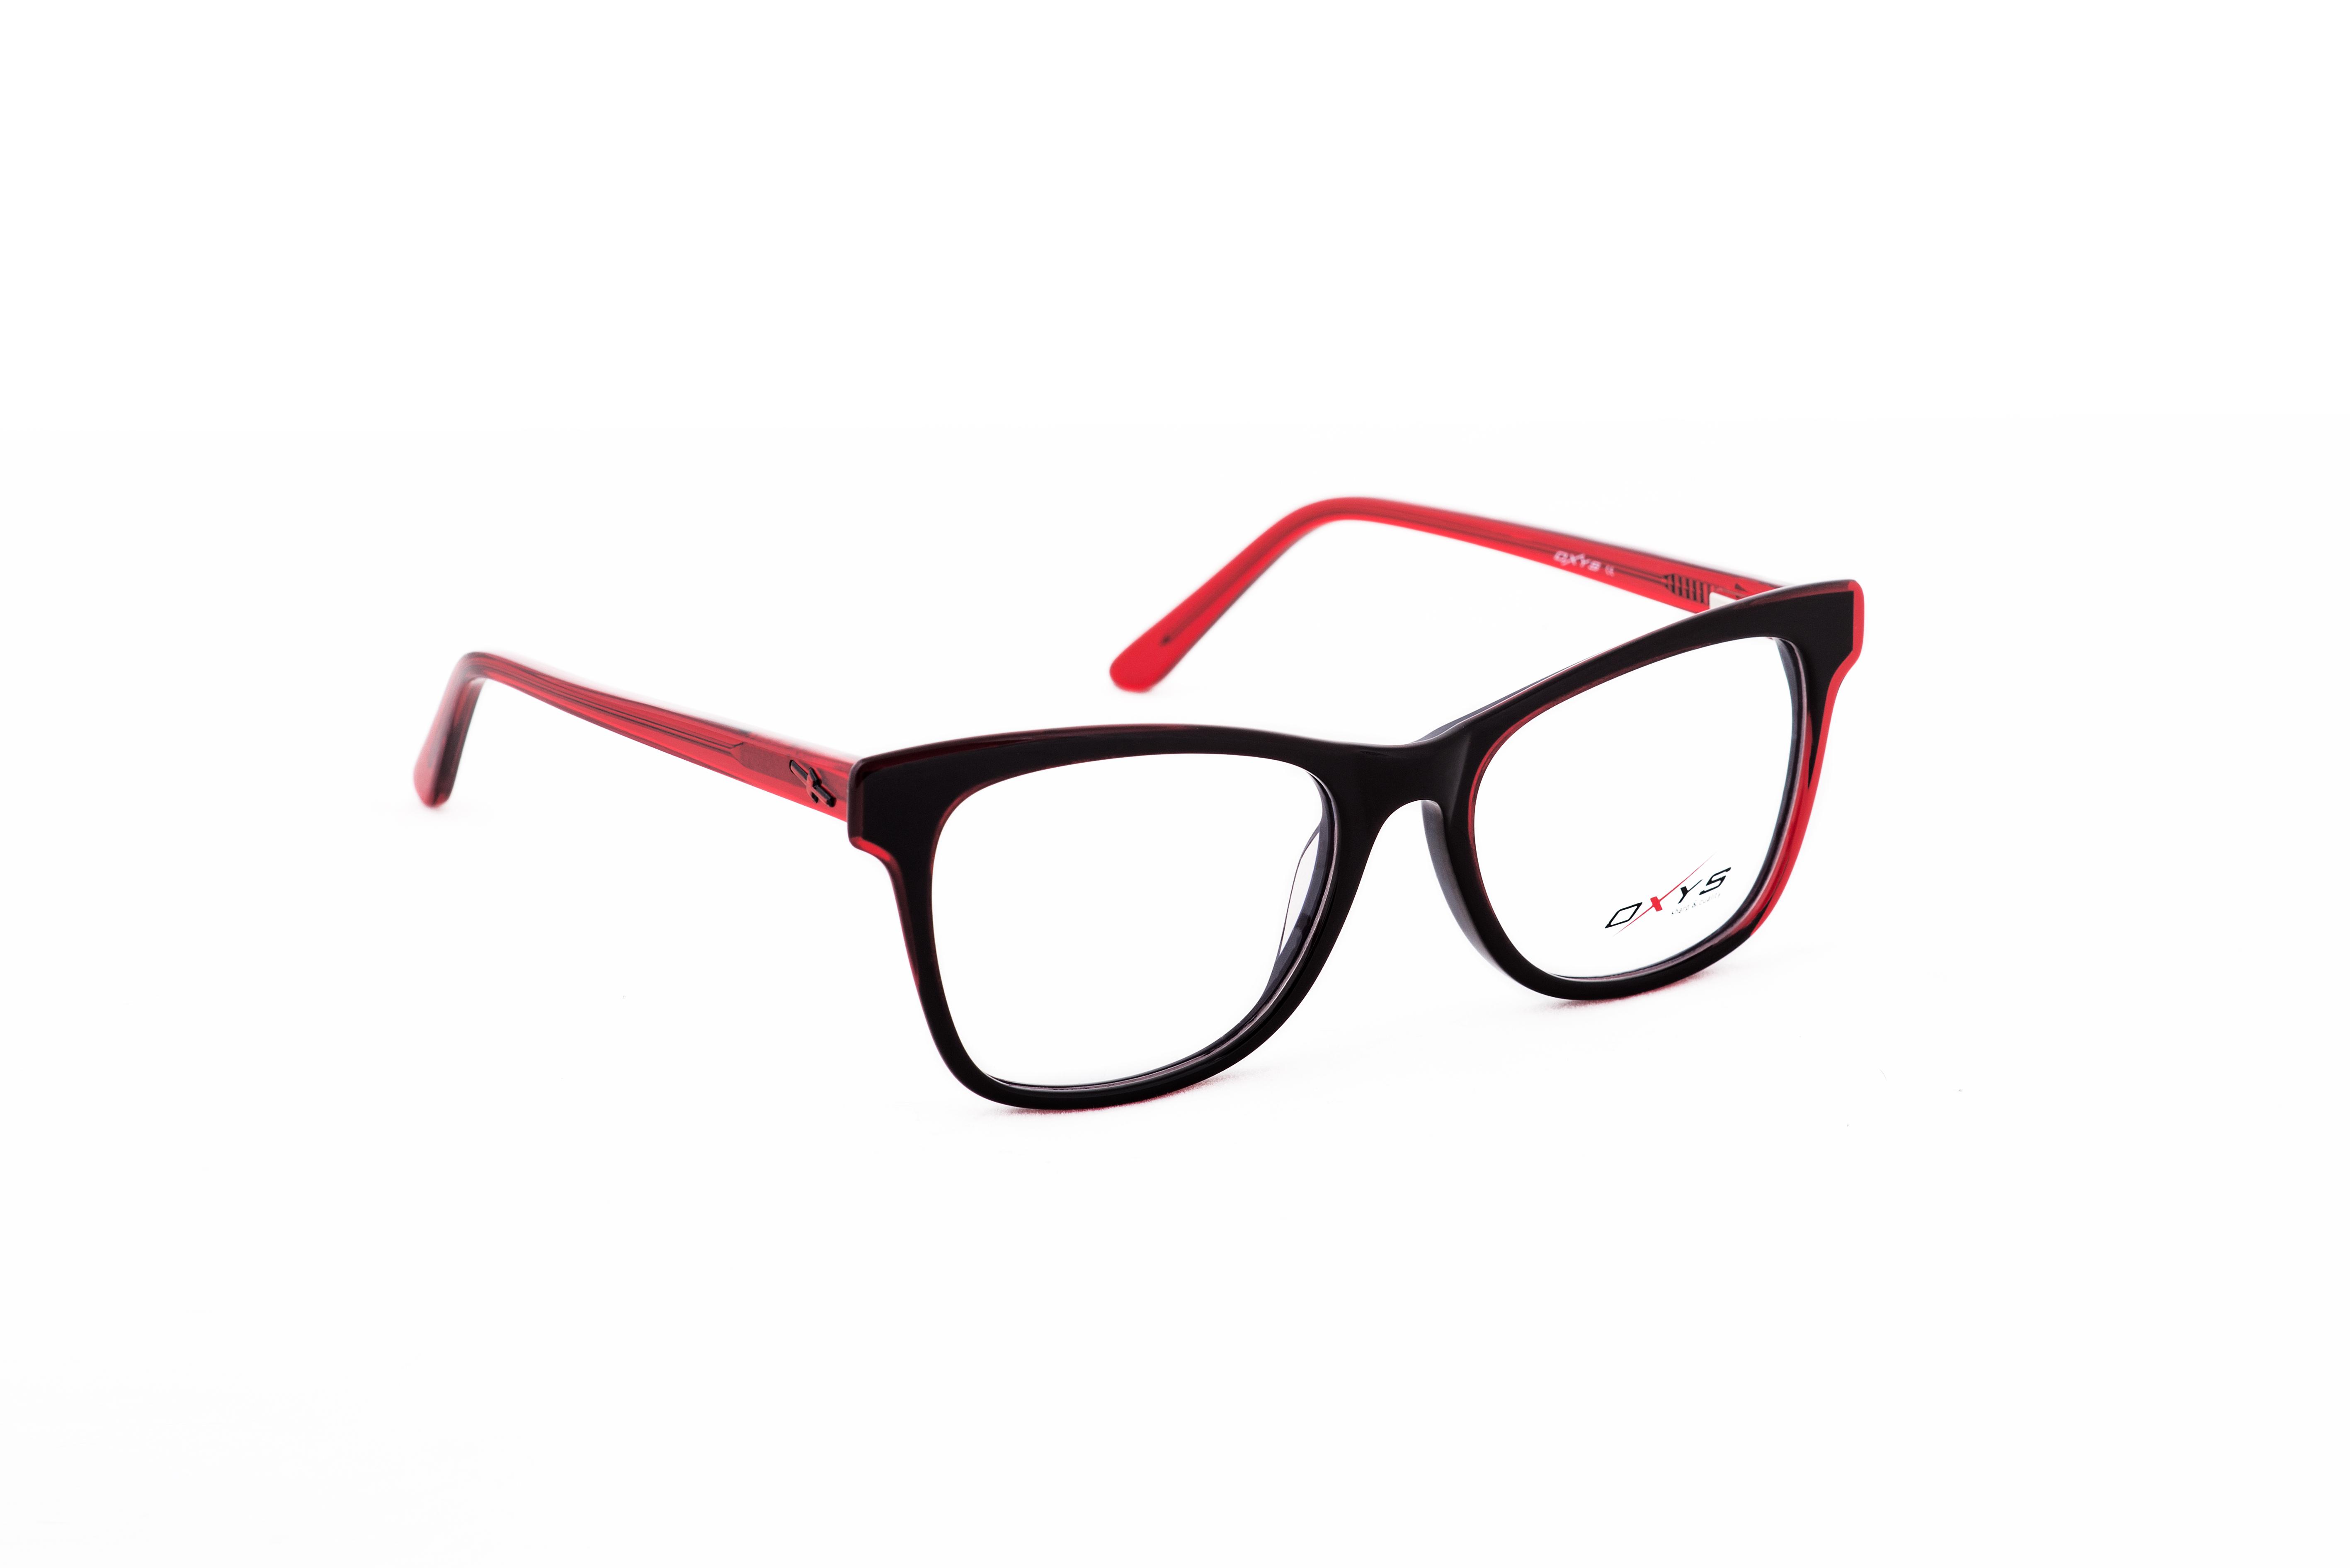 Rama de ochelari Oxys VX031 C2